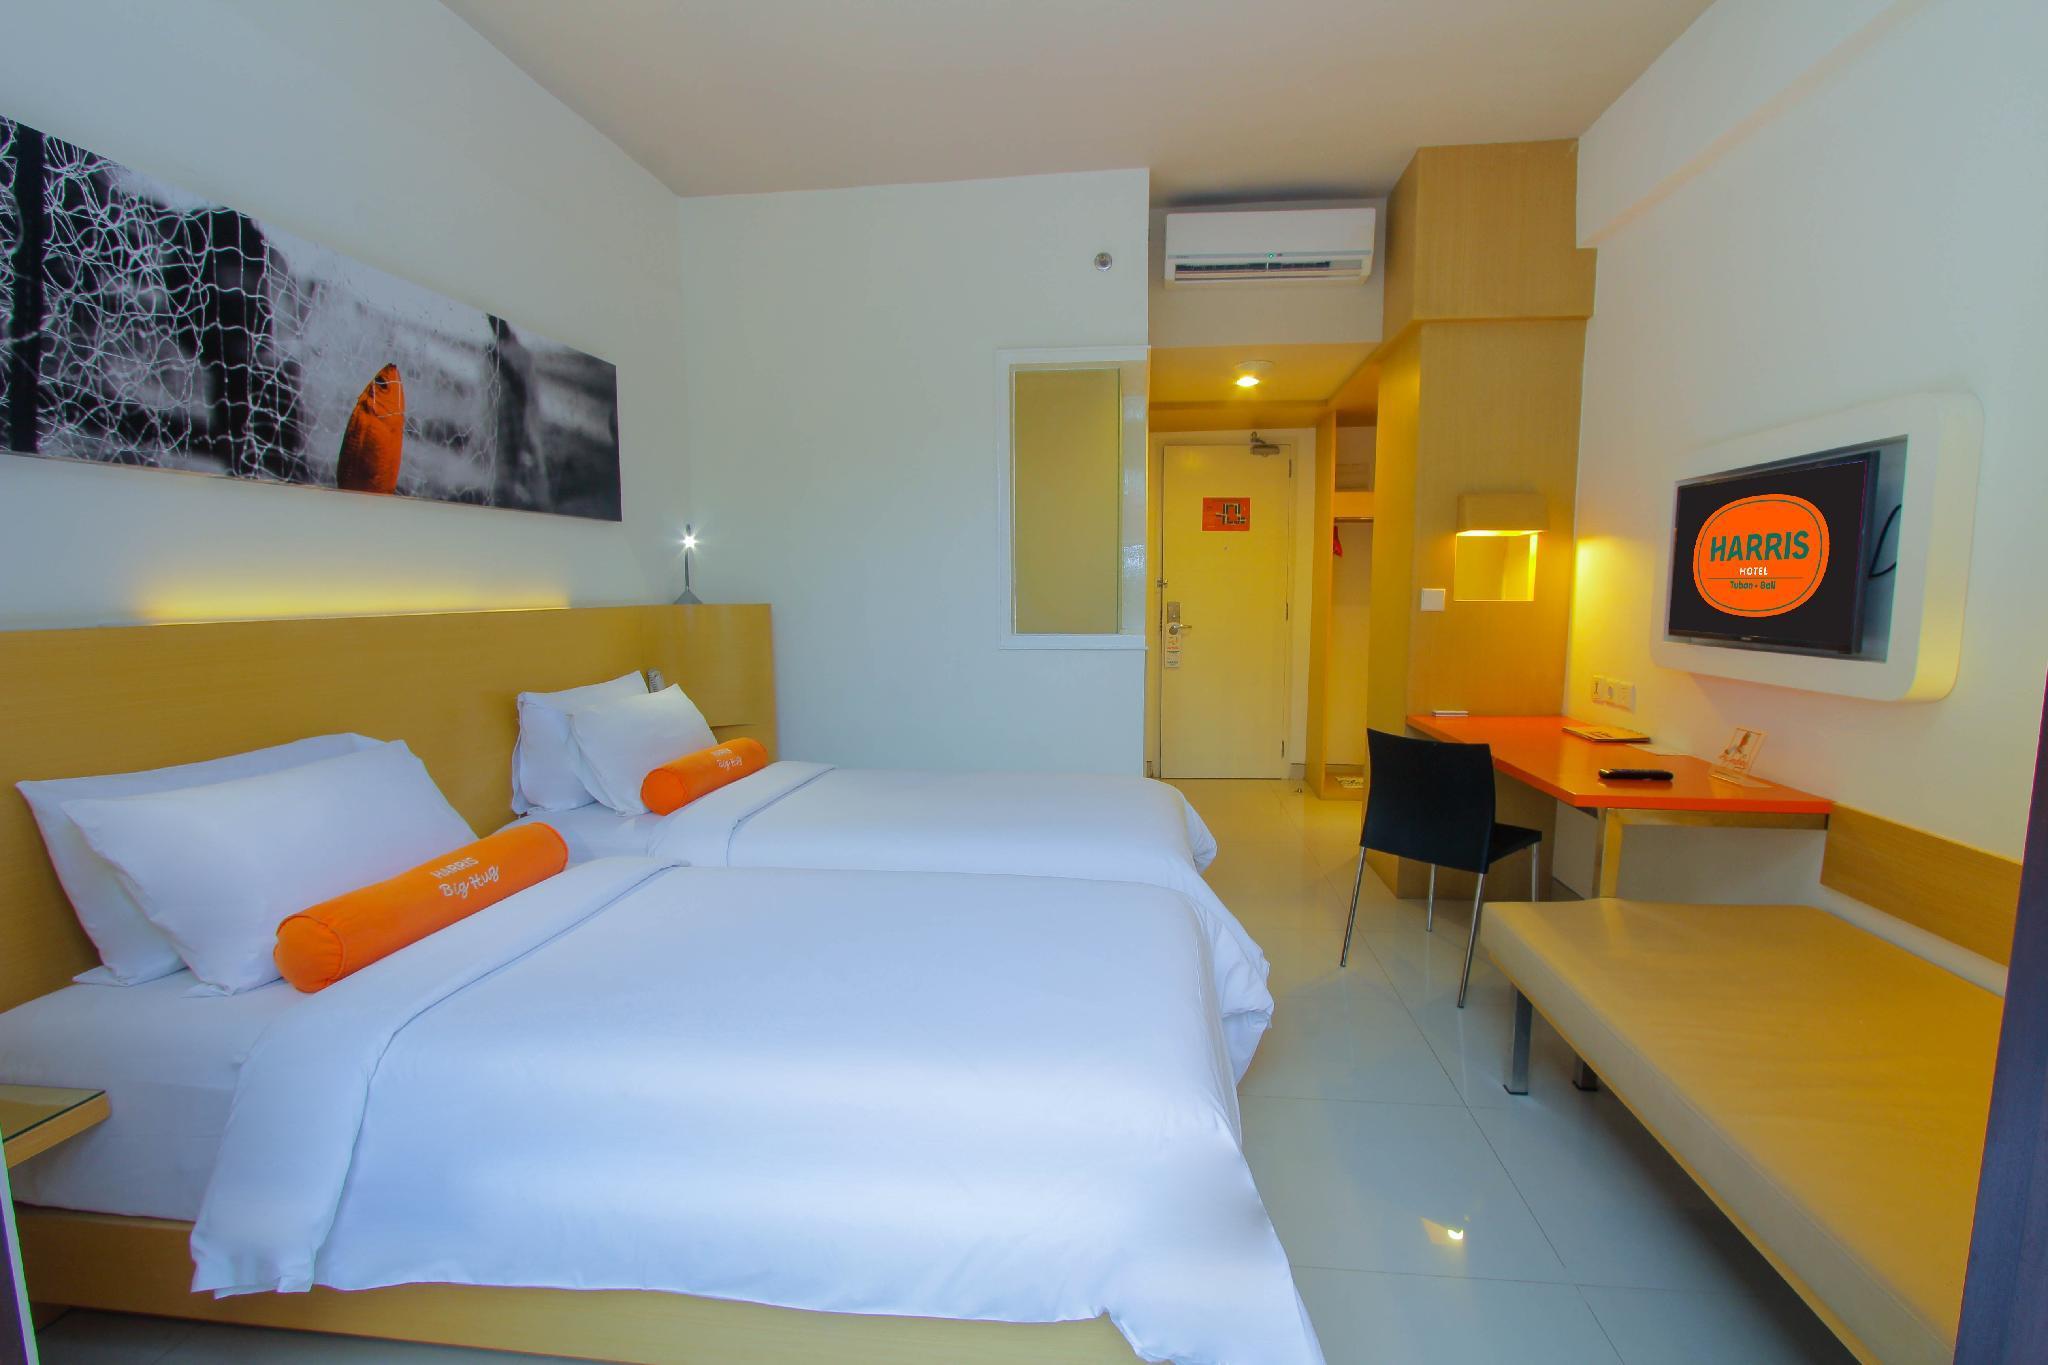 Harris Hotel Tuban Kuta Bali Mulai Dari Rp 280446 Agoda Com